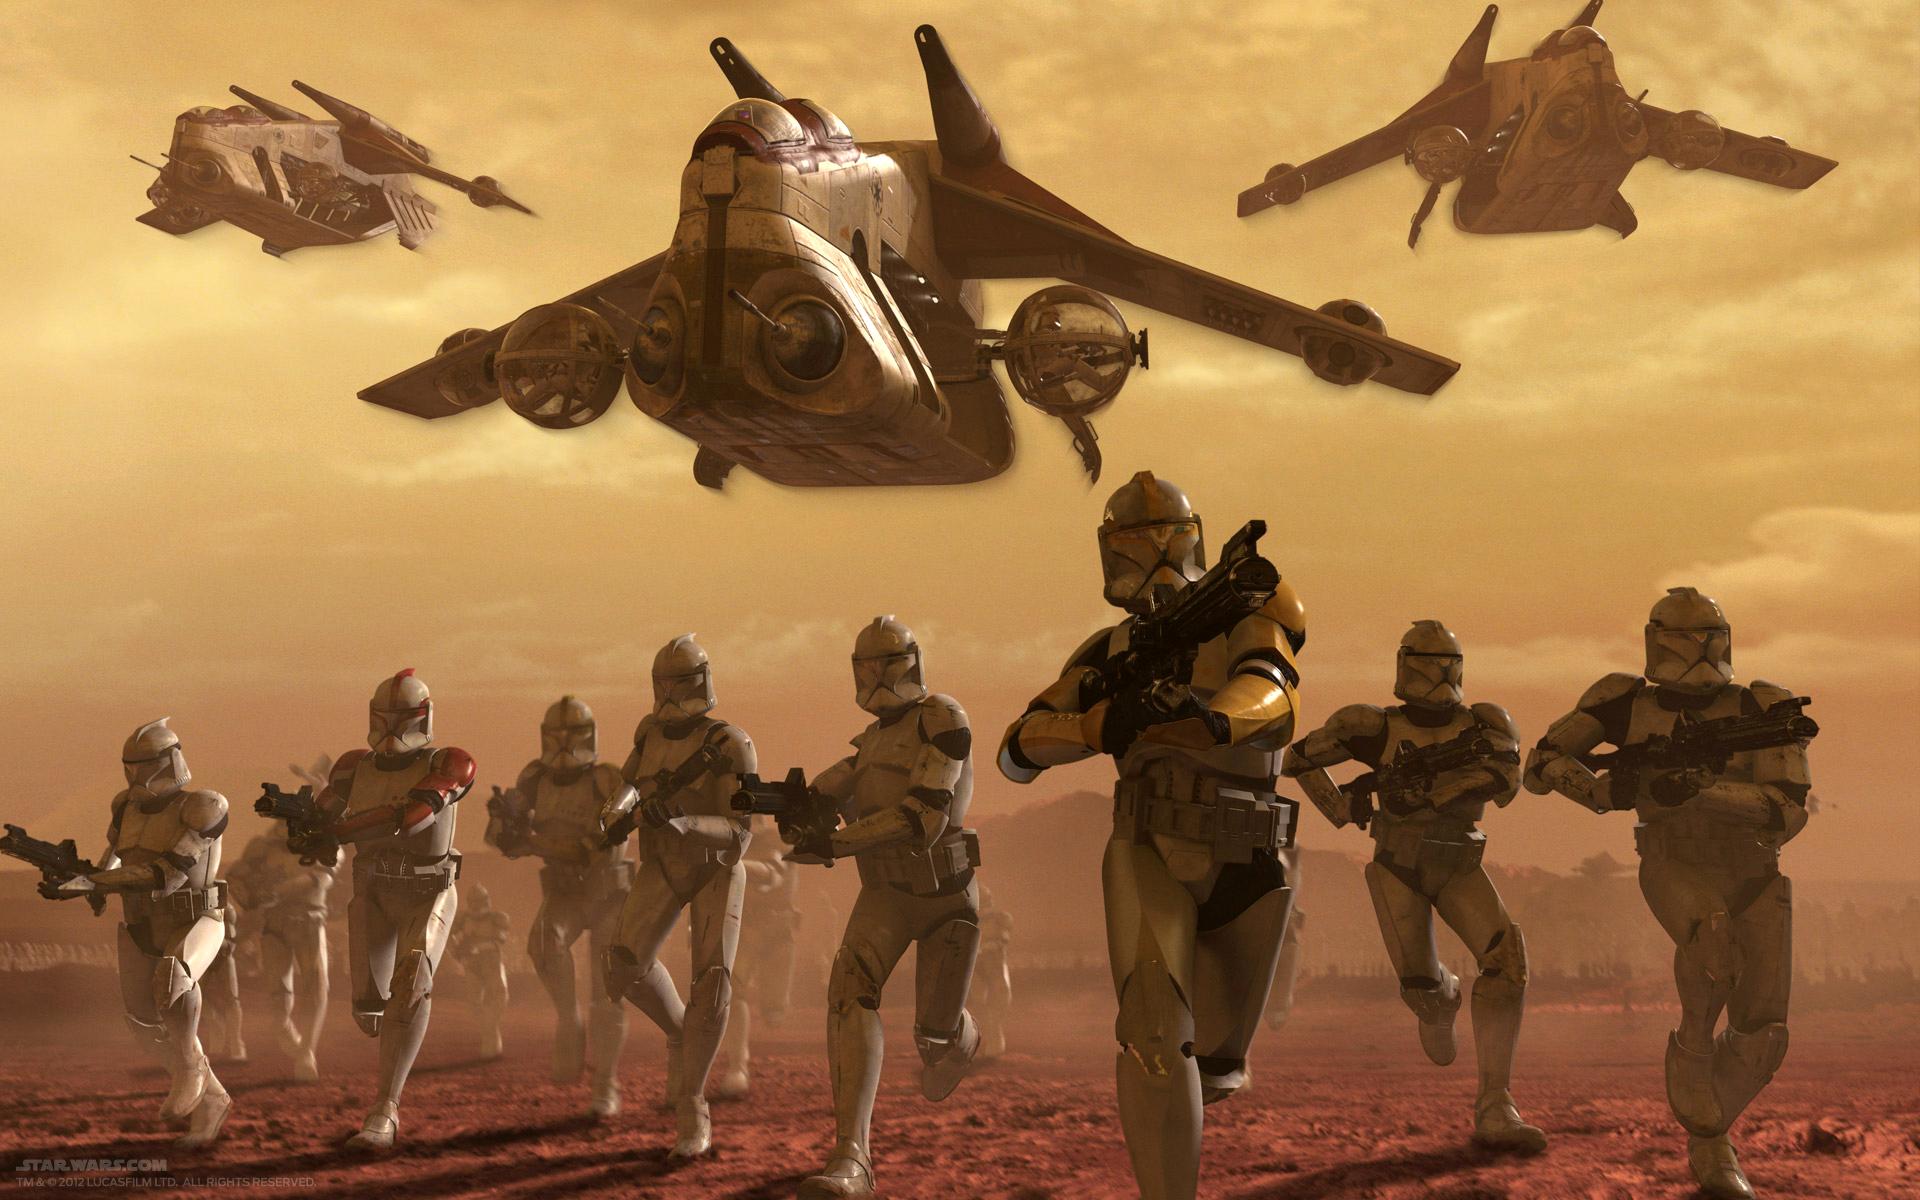 http://on-desktop.com/wps/Cartoons_Star_Wars__The_Clone_Wars_the_invasion_051921_.jpg